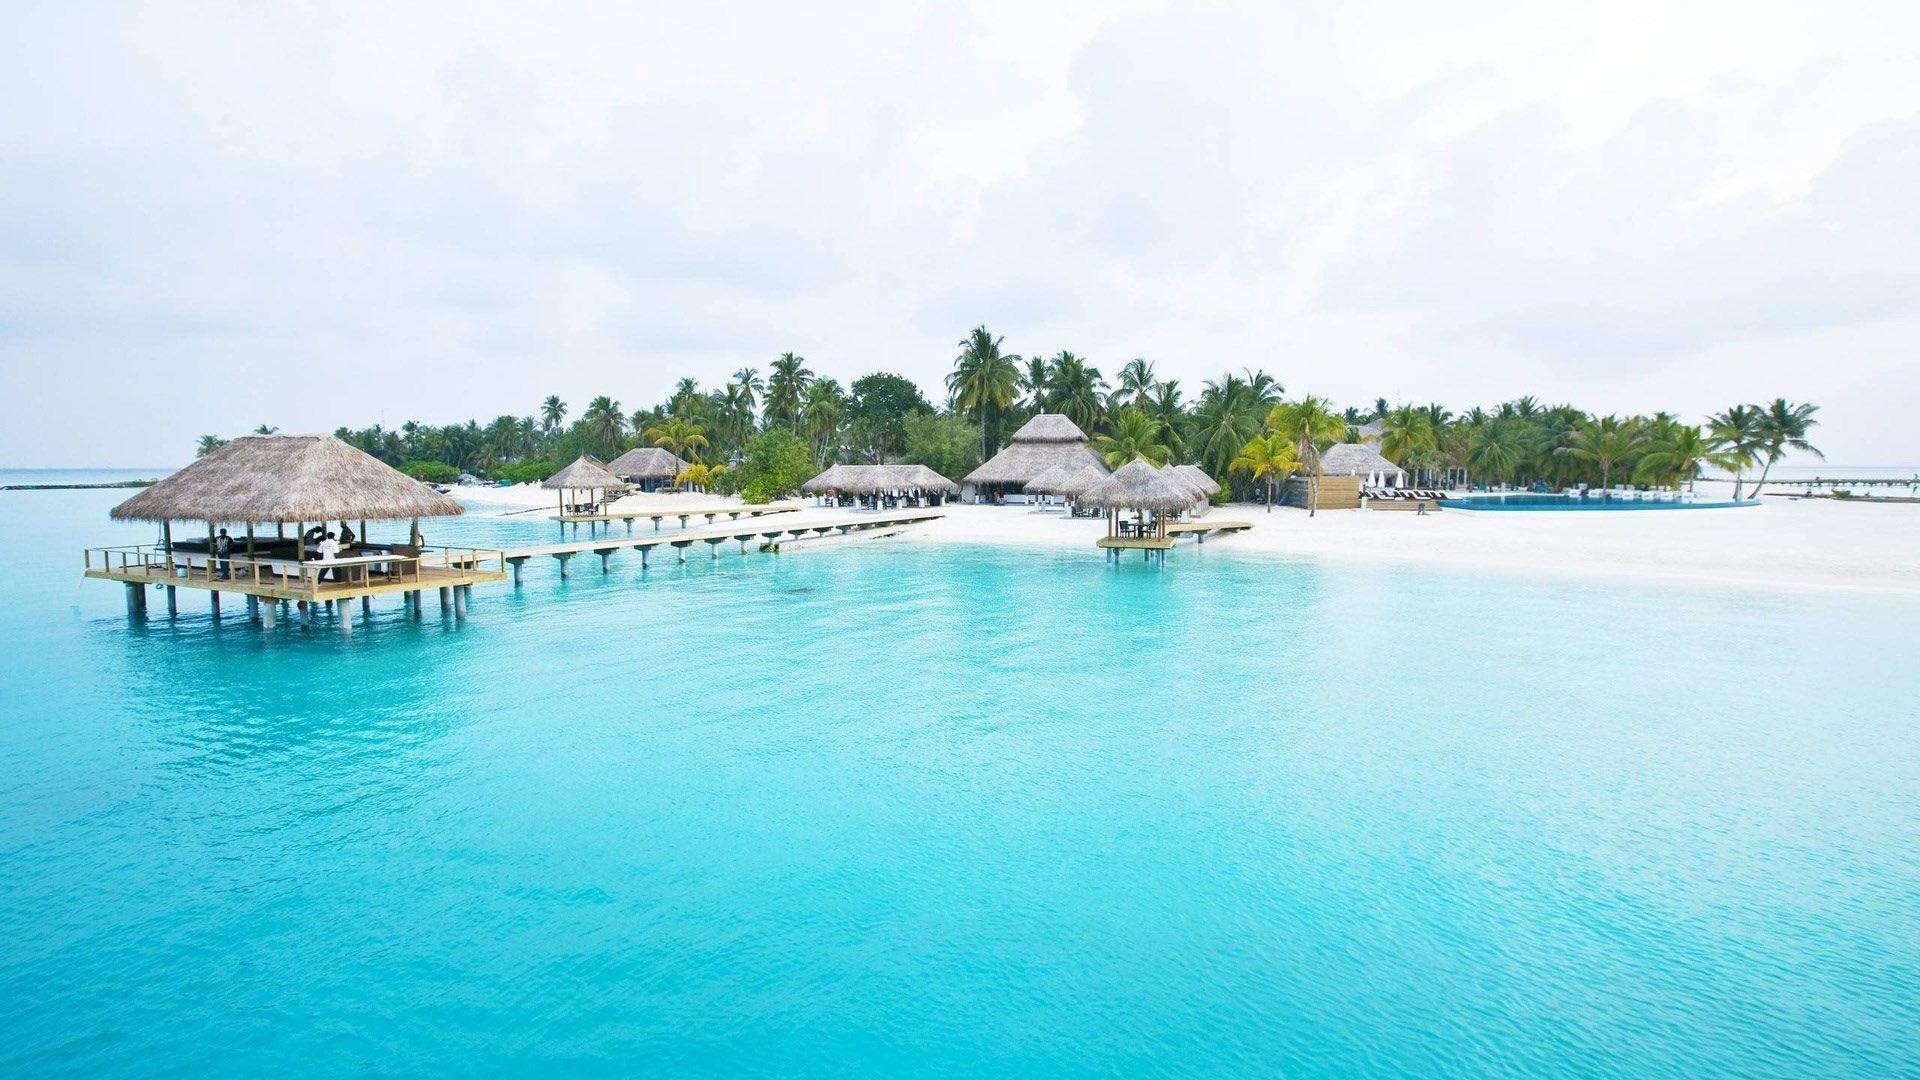 Nice Maldives Beach Wallpapers Beach Wallpaper Maldives